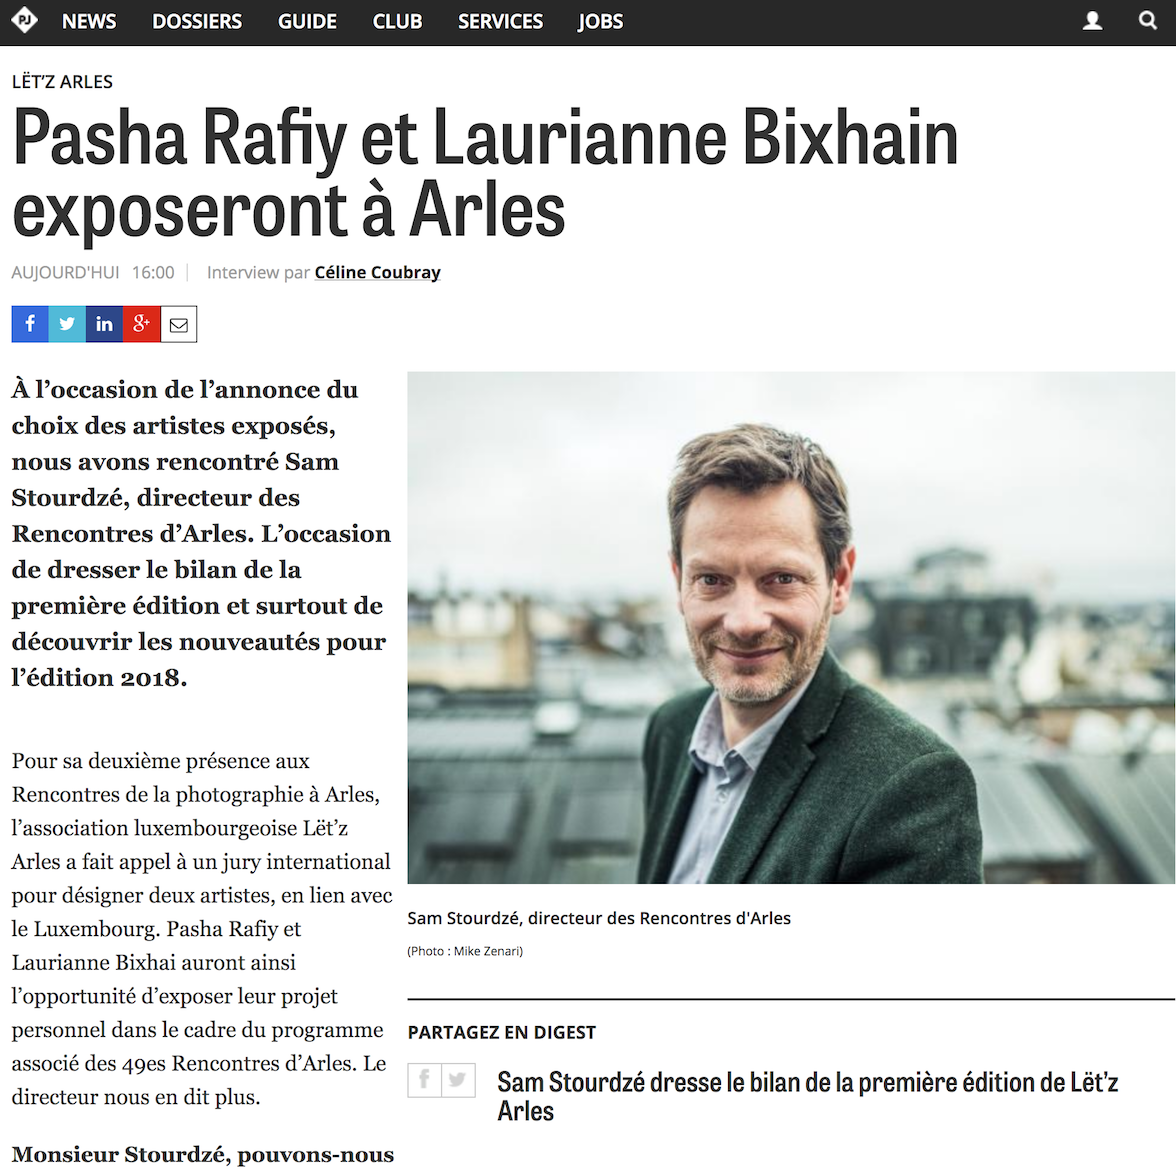 Paperjam - 14 février 2018Pasha Rafiy et Laurianne Bixhain exposeront à Arles